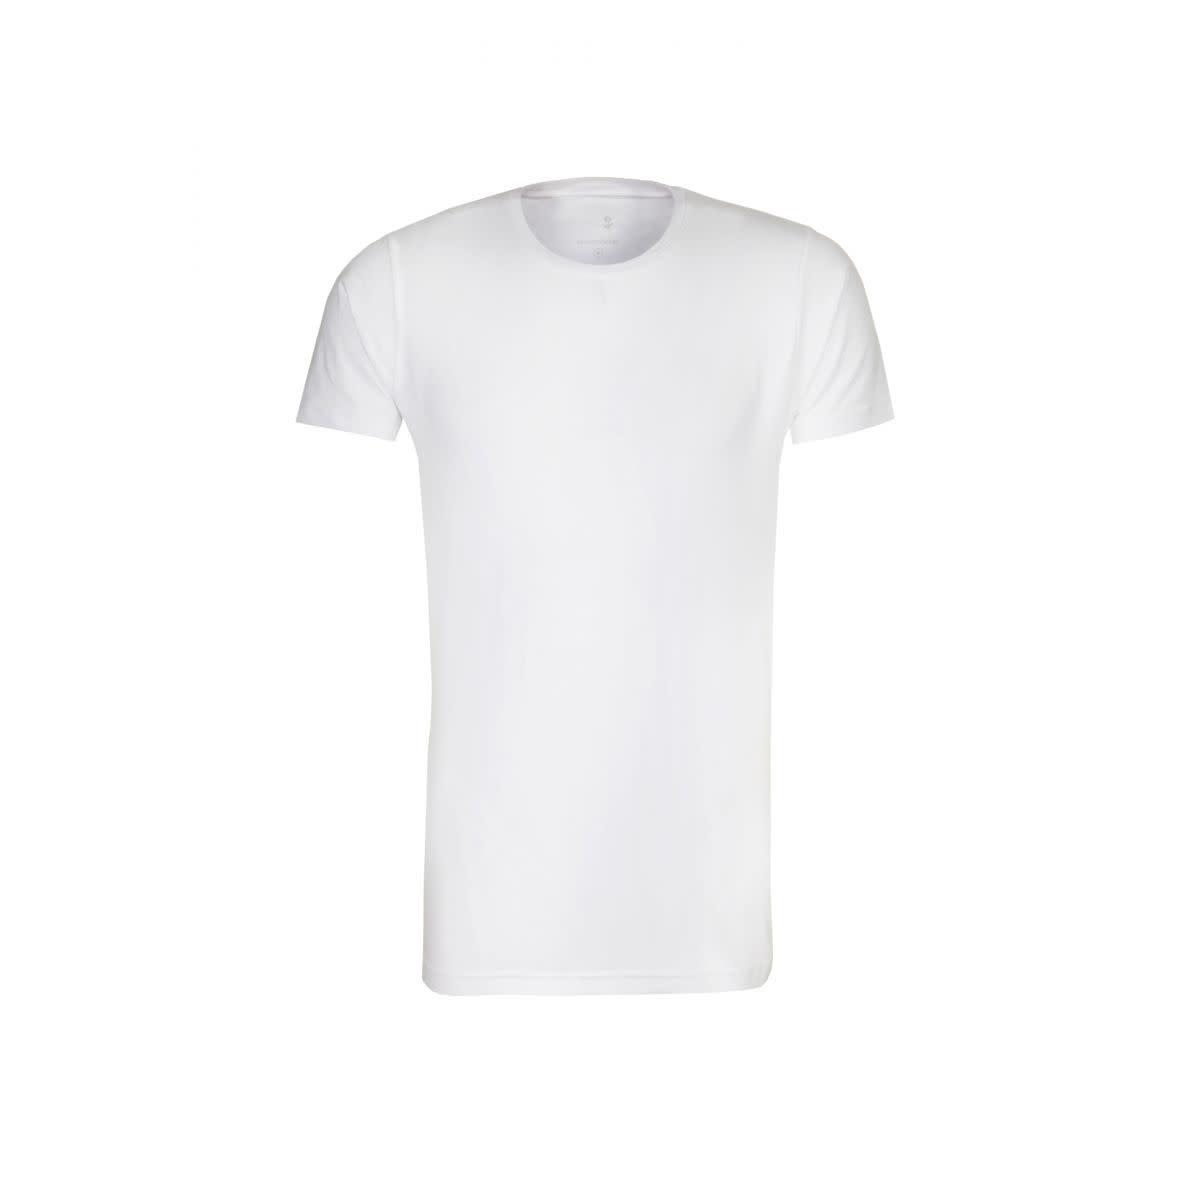 H&M T-Shirt à personnaliser blanc